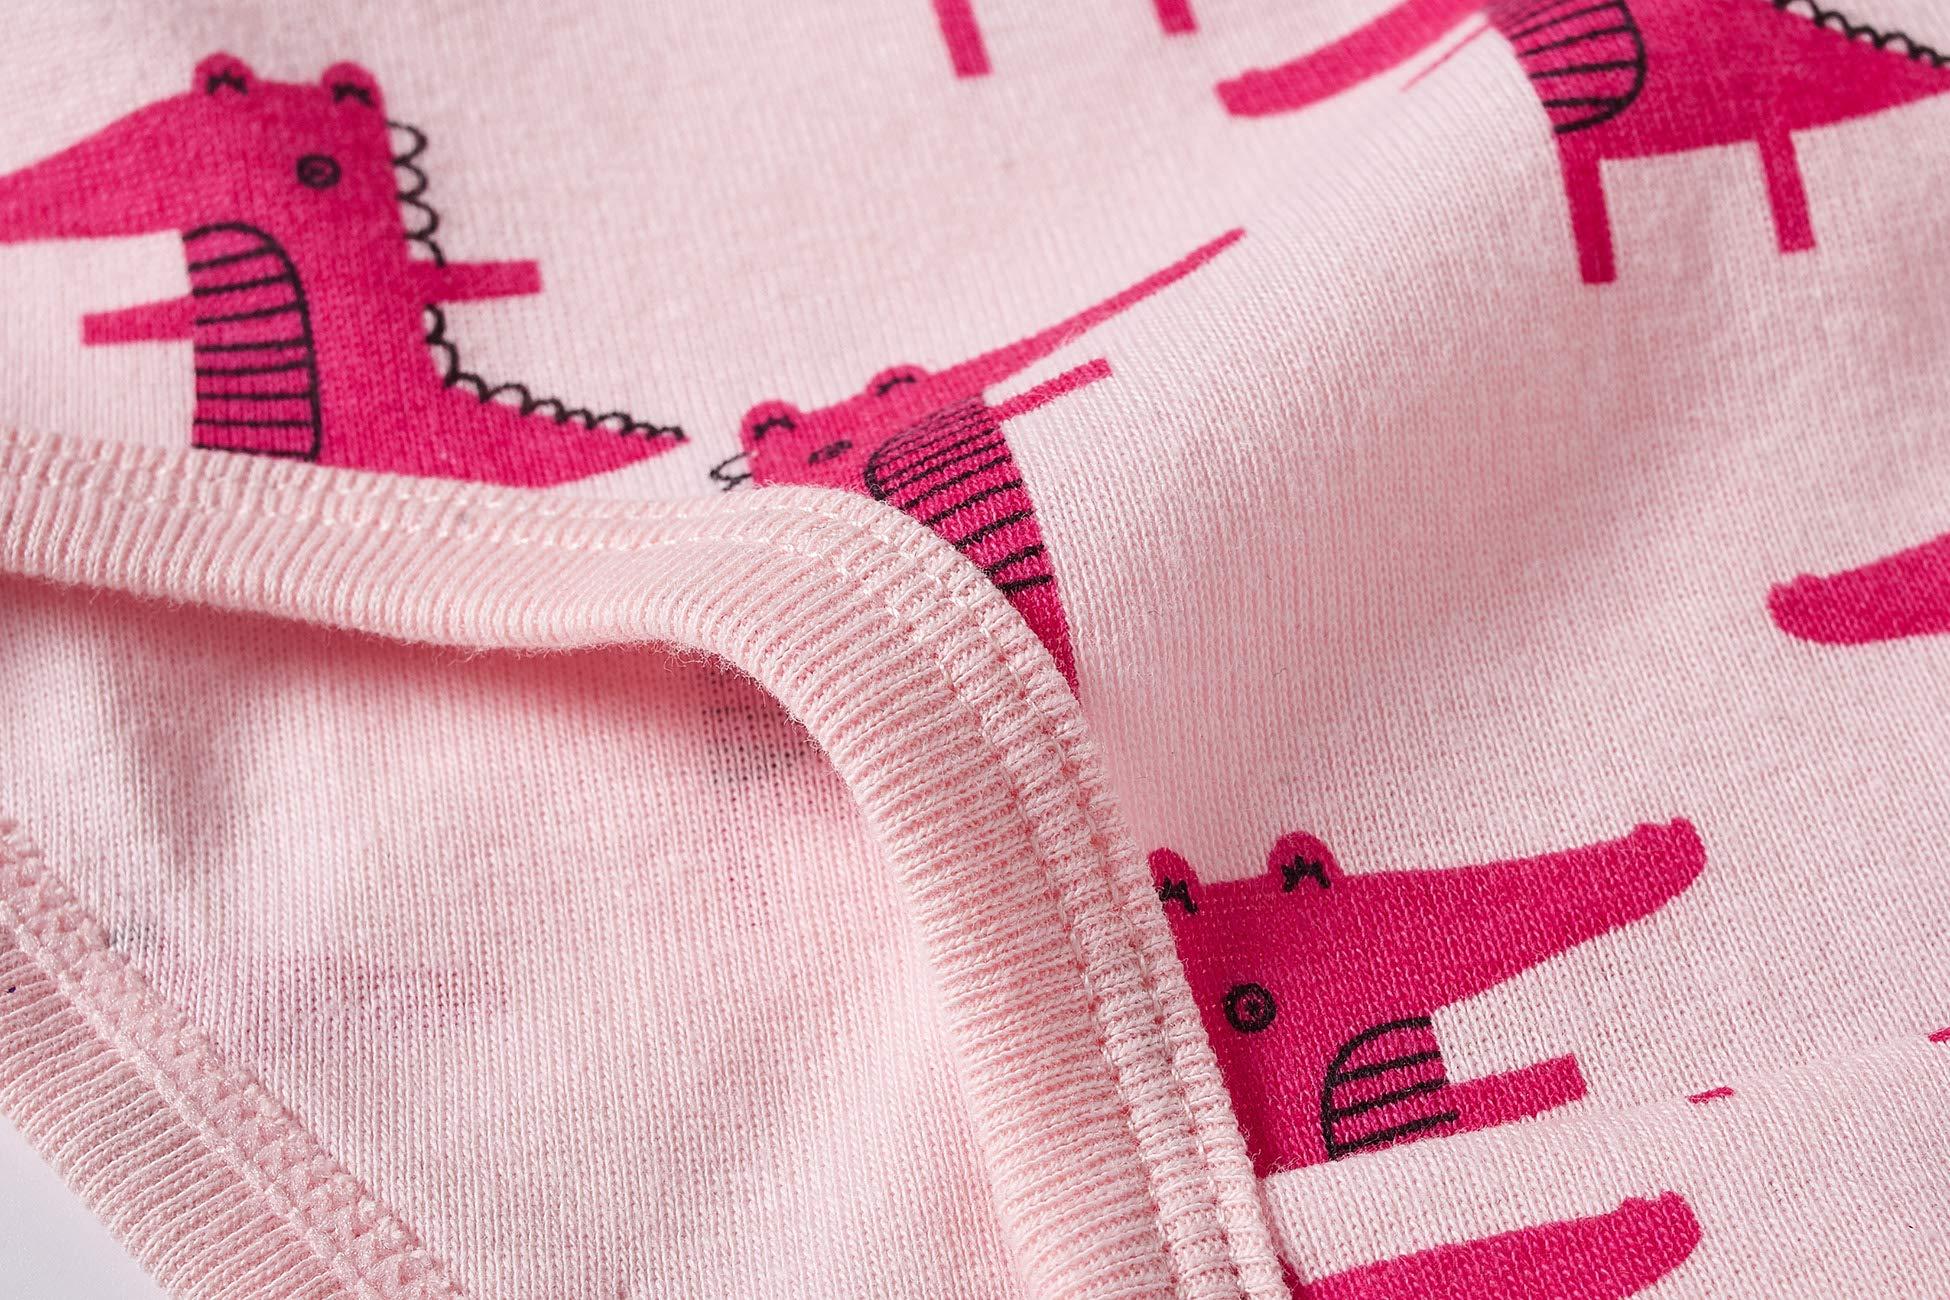 Baby Soft Cotton Panties Little Girls'Briefs Toddler Underwear (Pack of 6)